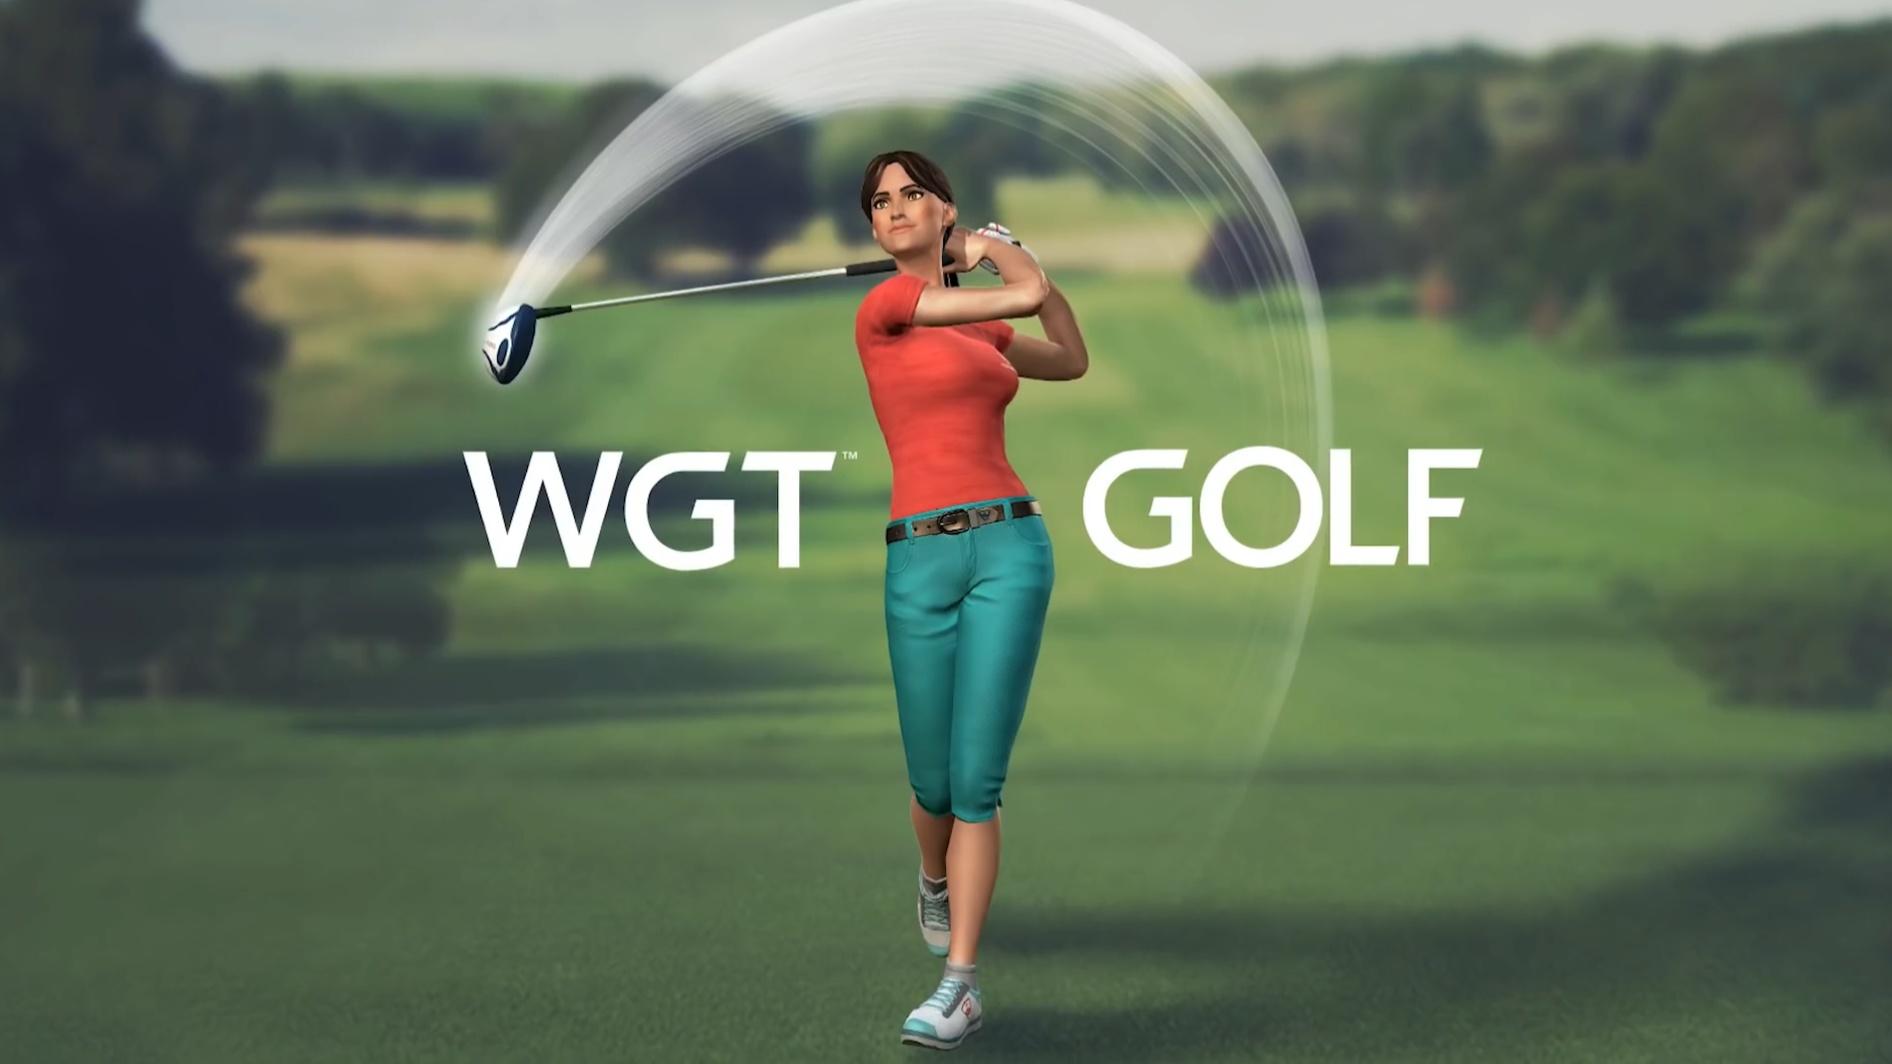 WGT Golf MOD APK